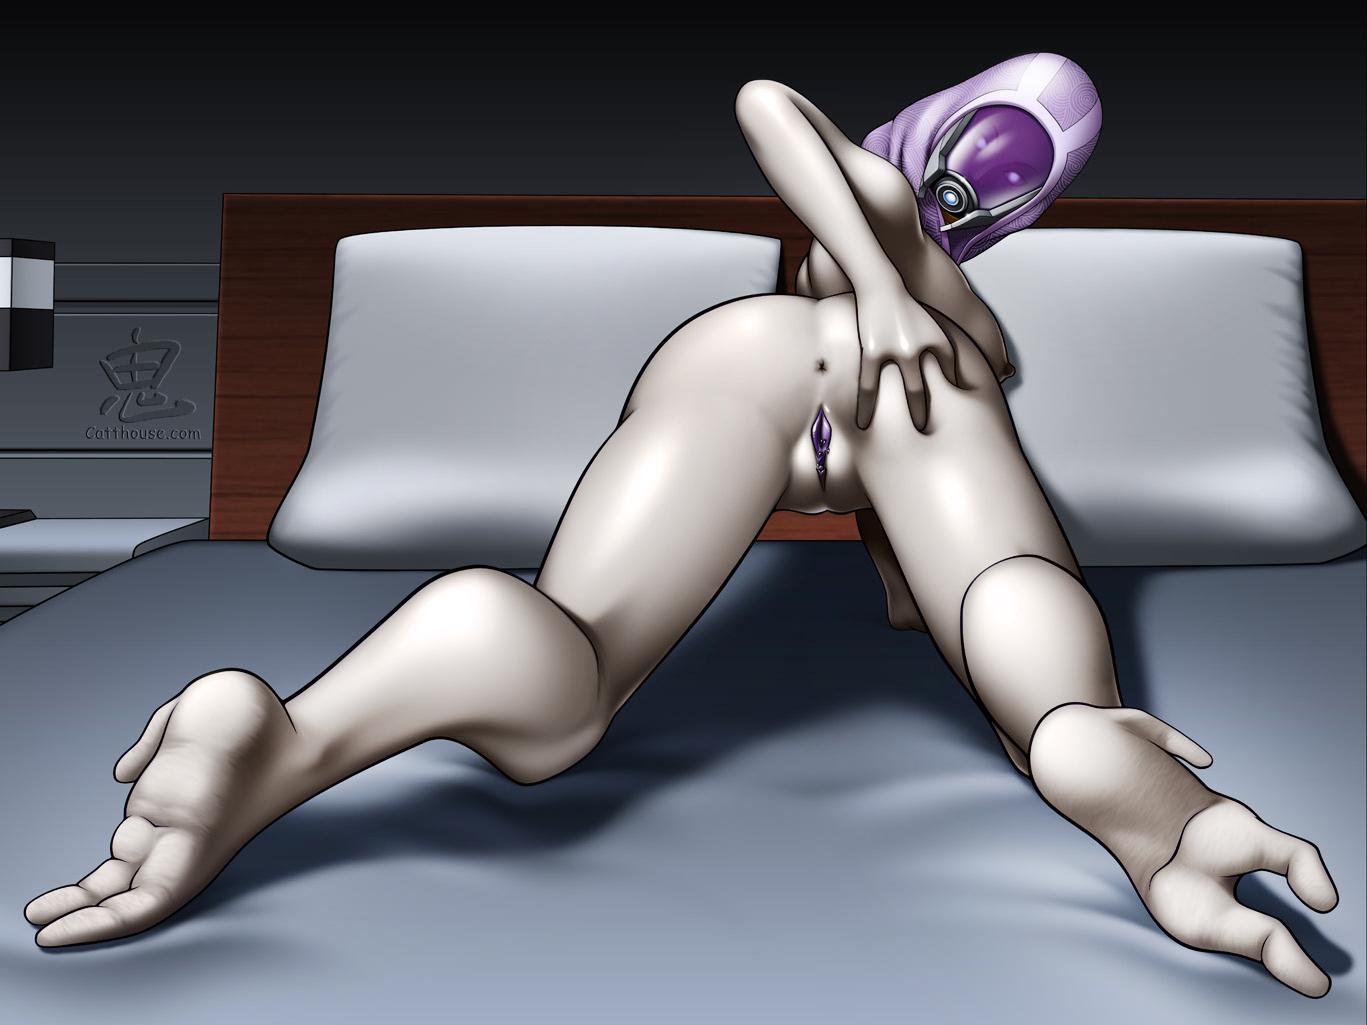 Mass effect 2 tali sexy hentai gif pron pornstar